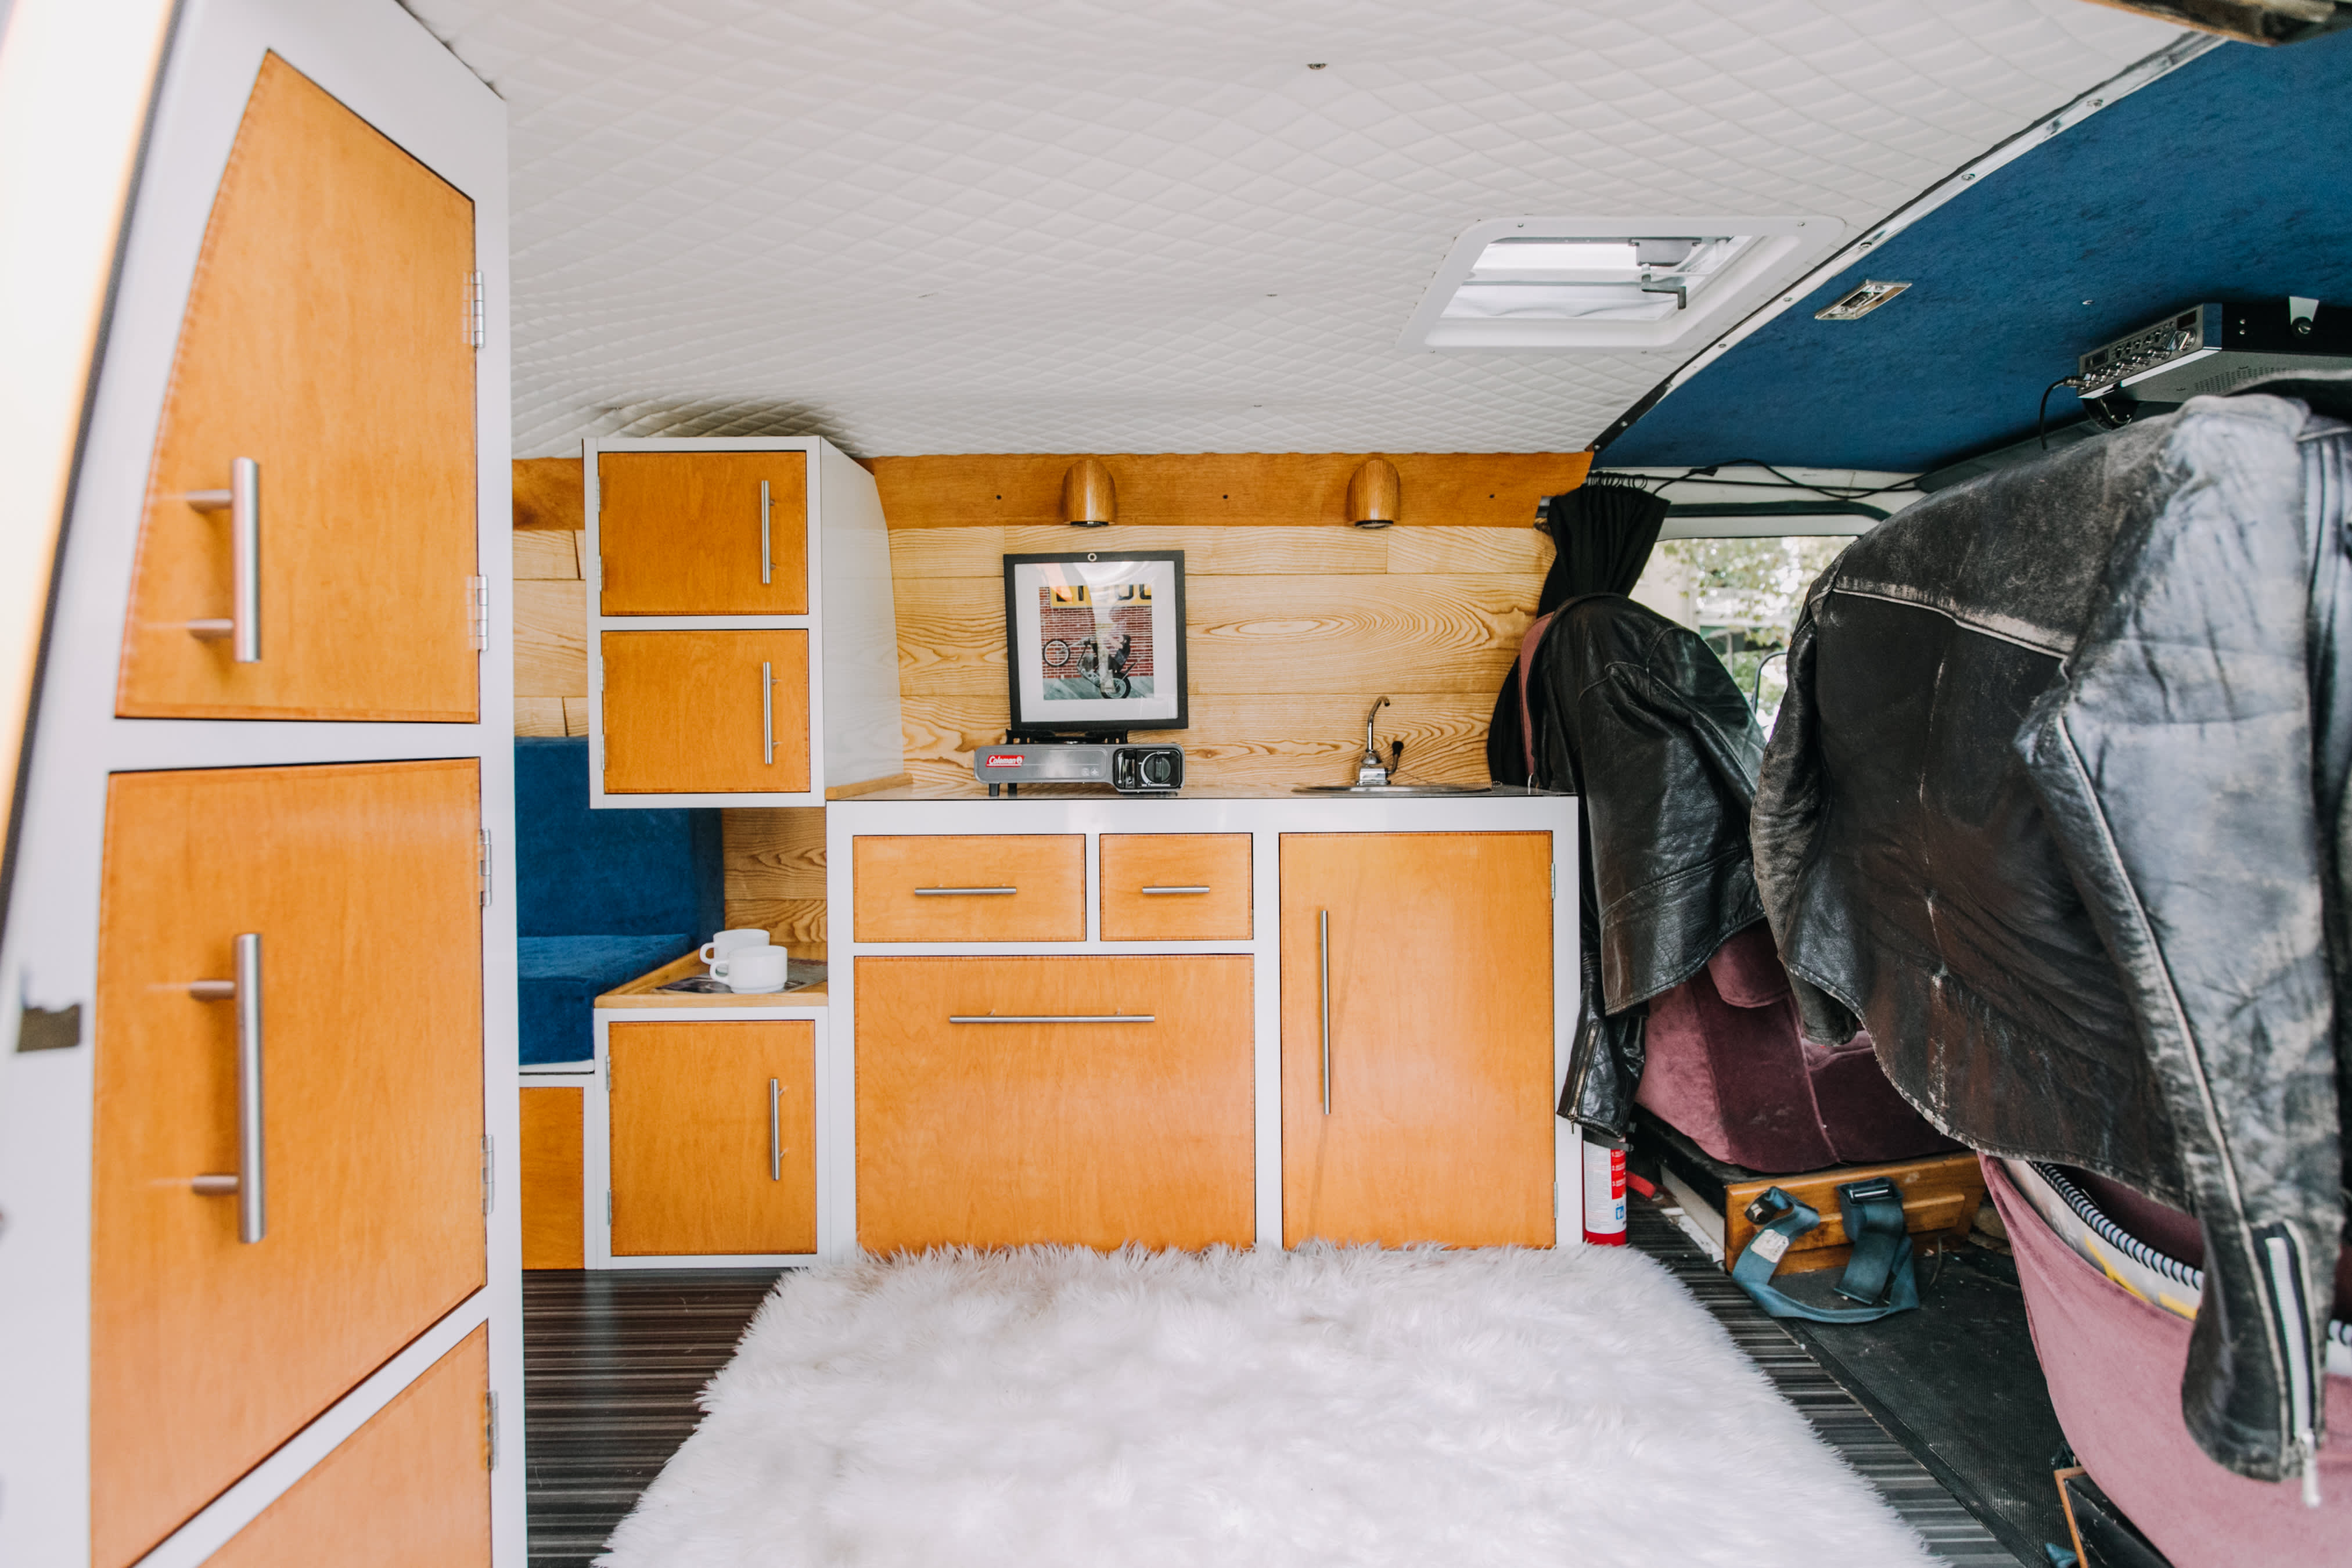 1970s Van Conversion Tiny Home Tour | Apartment Therapy